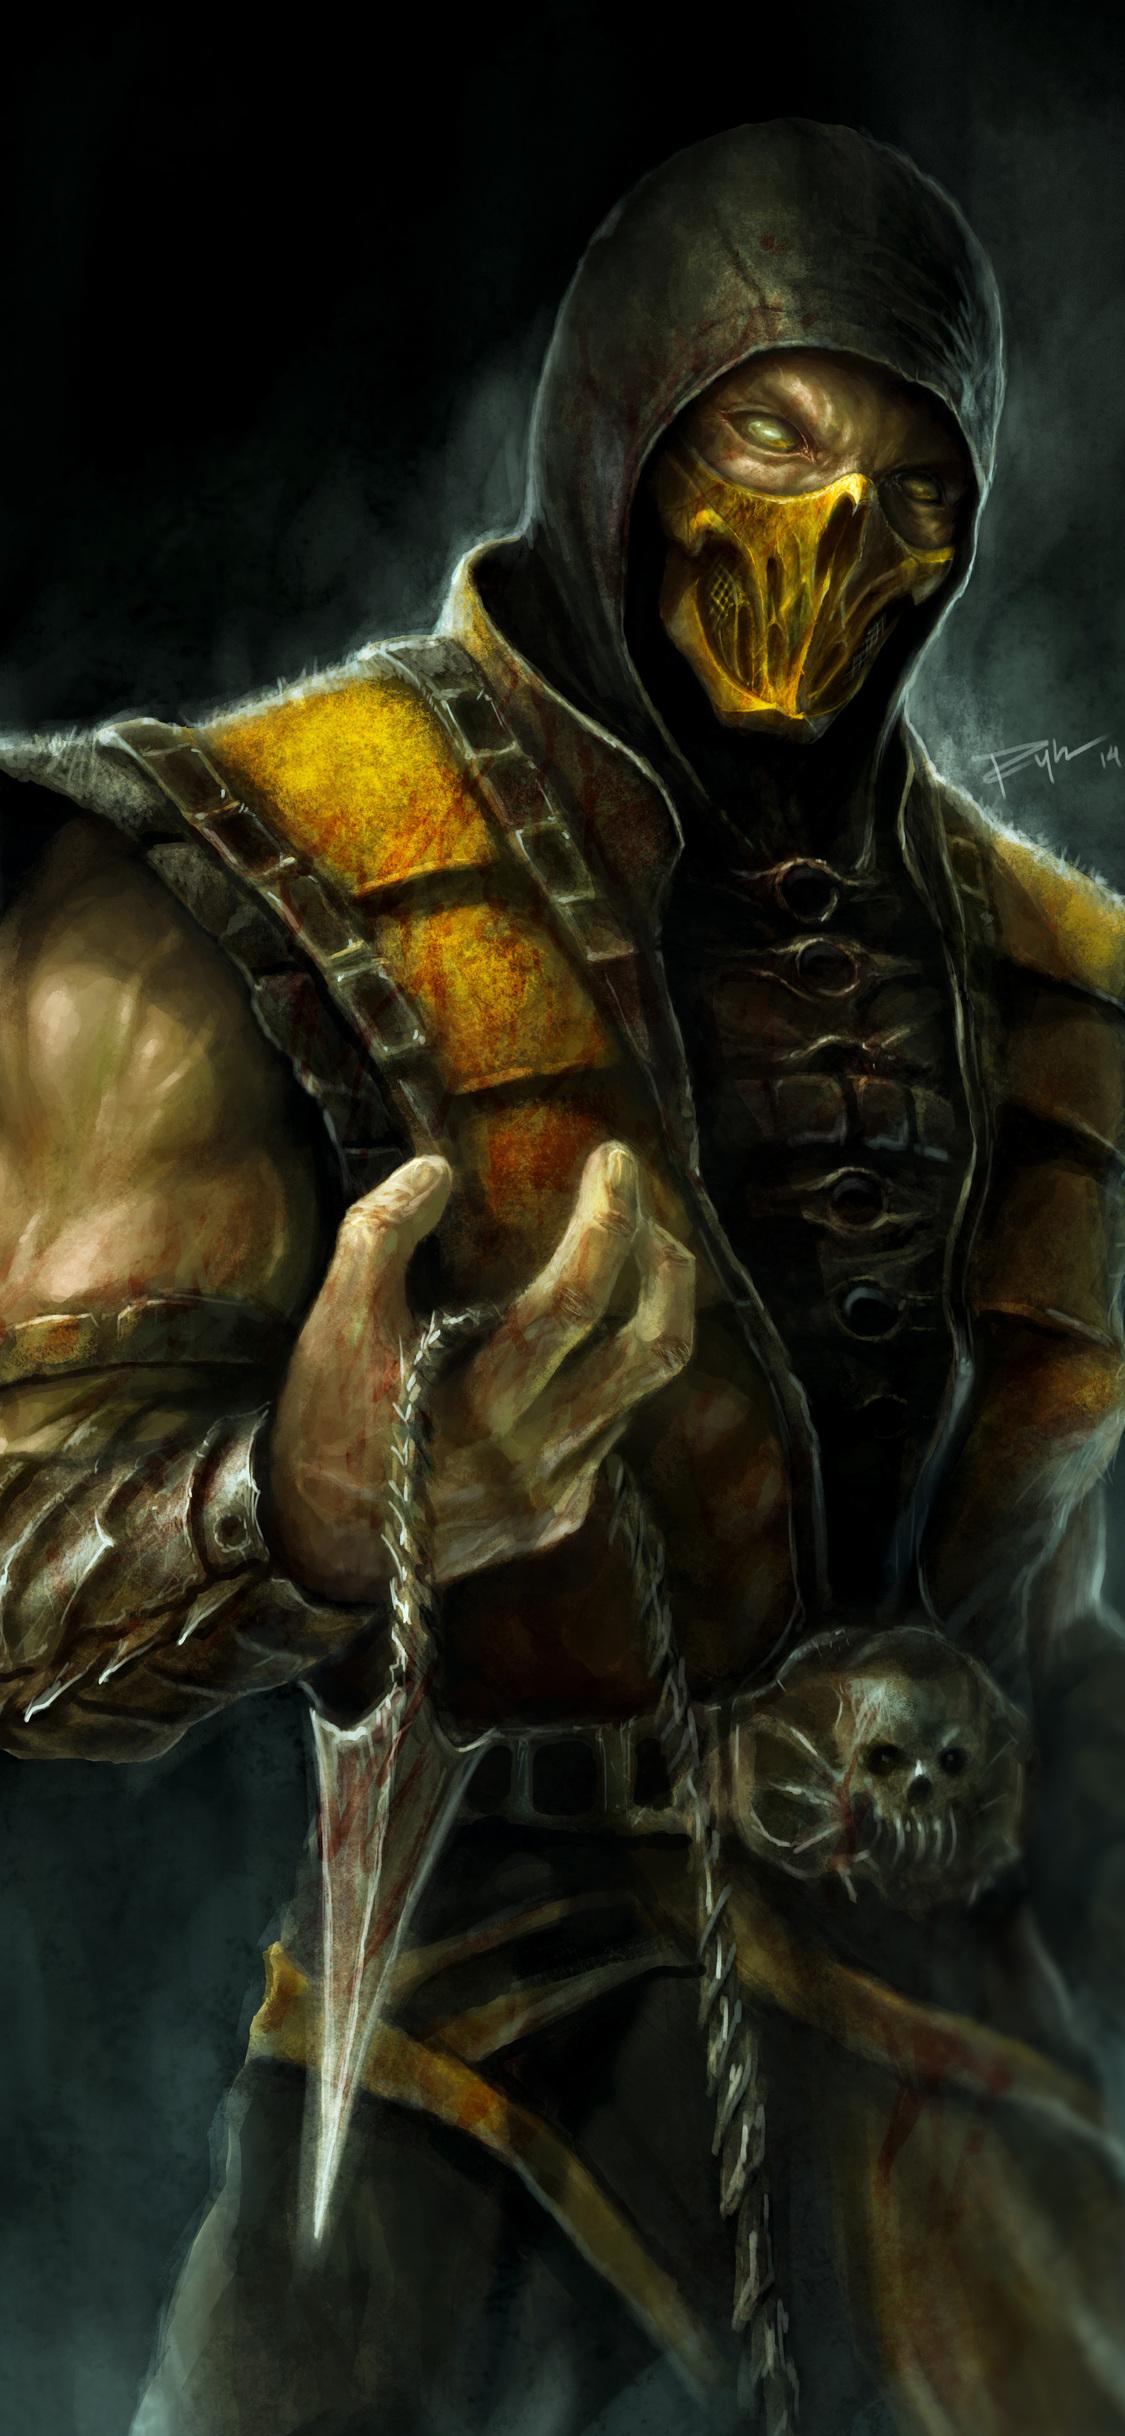 1125x2436 Scorpion Mortal Kombat X 4k Artwork Iphone Xs Iphone 10